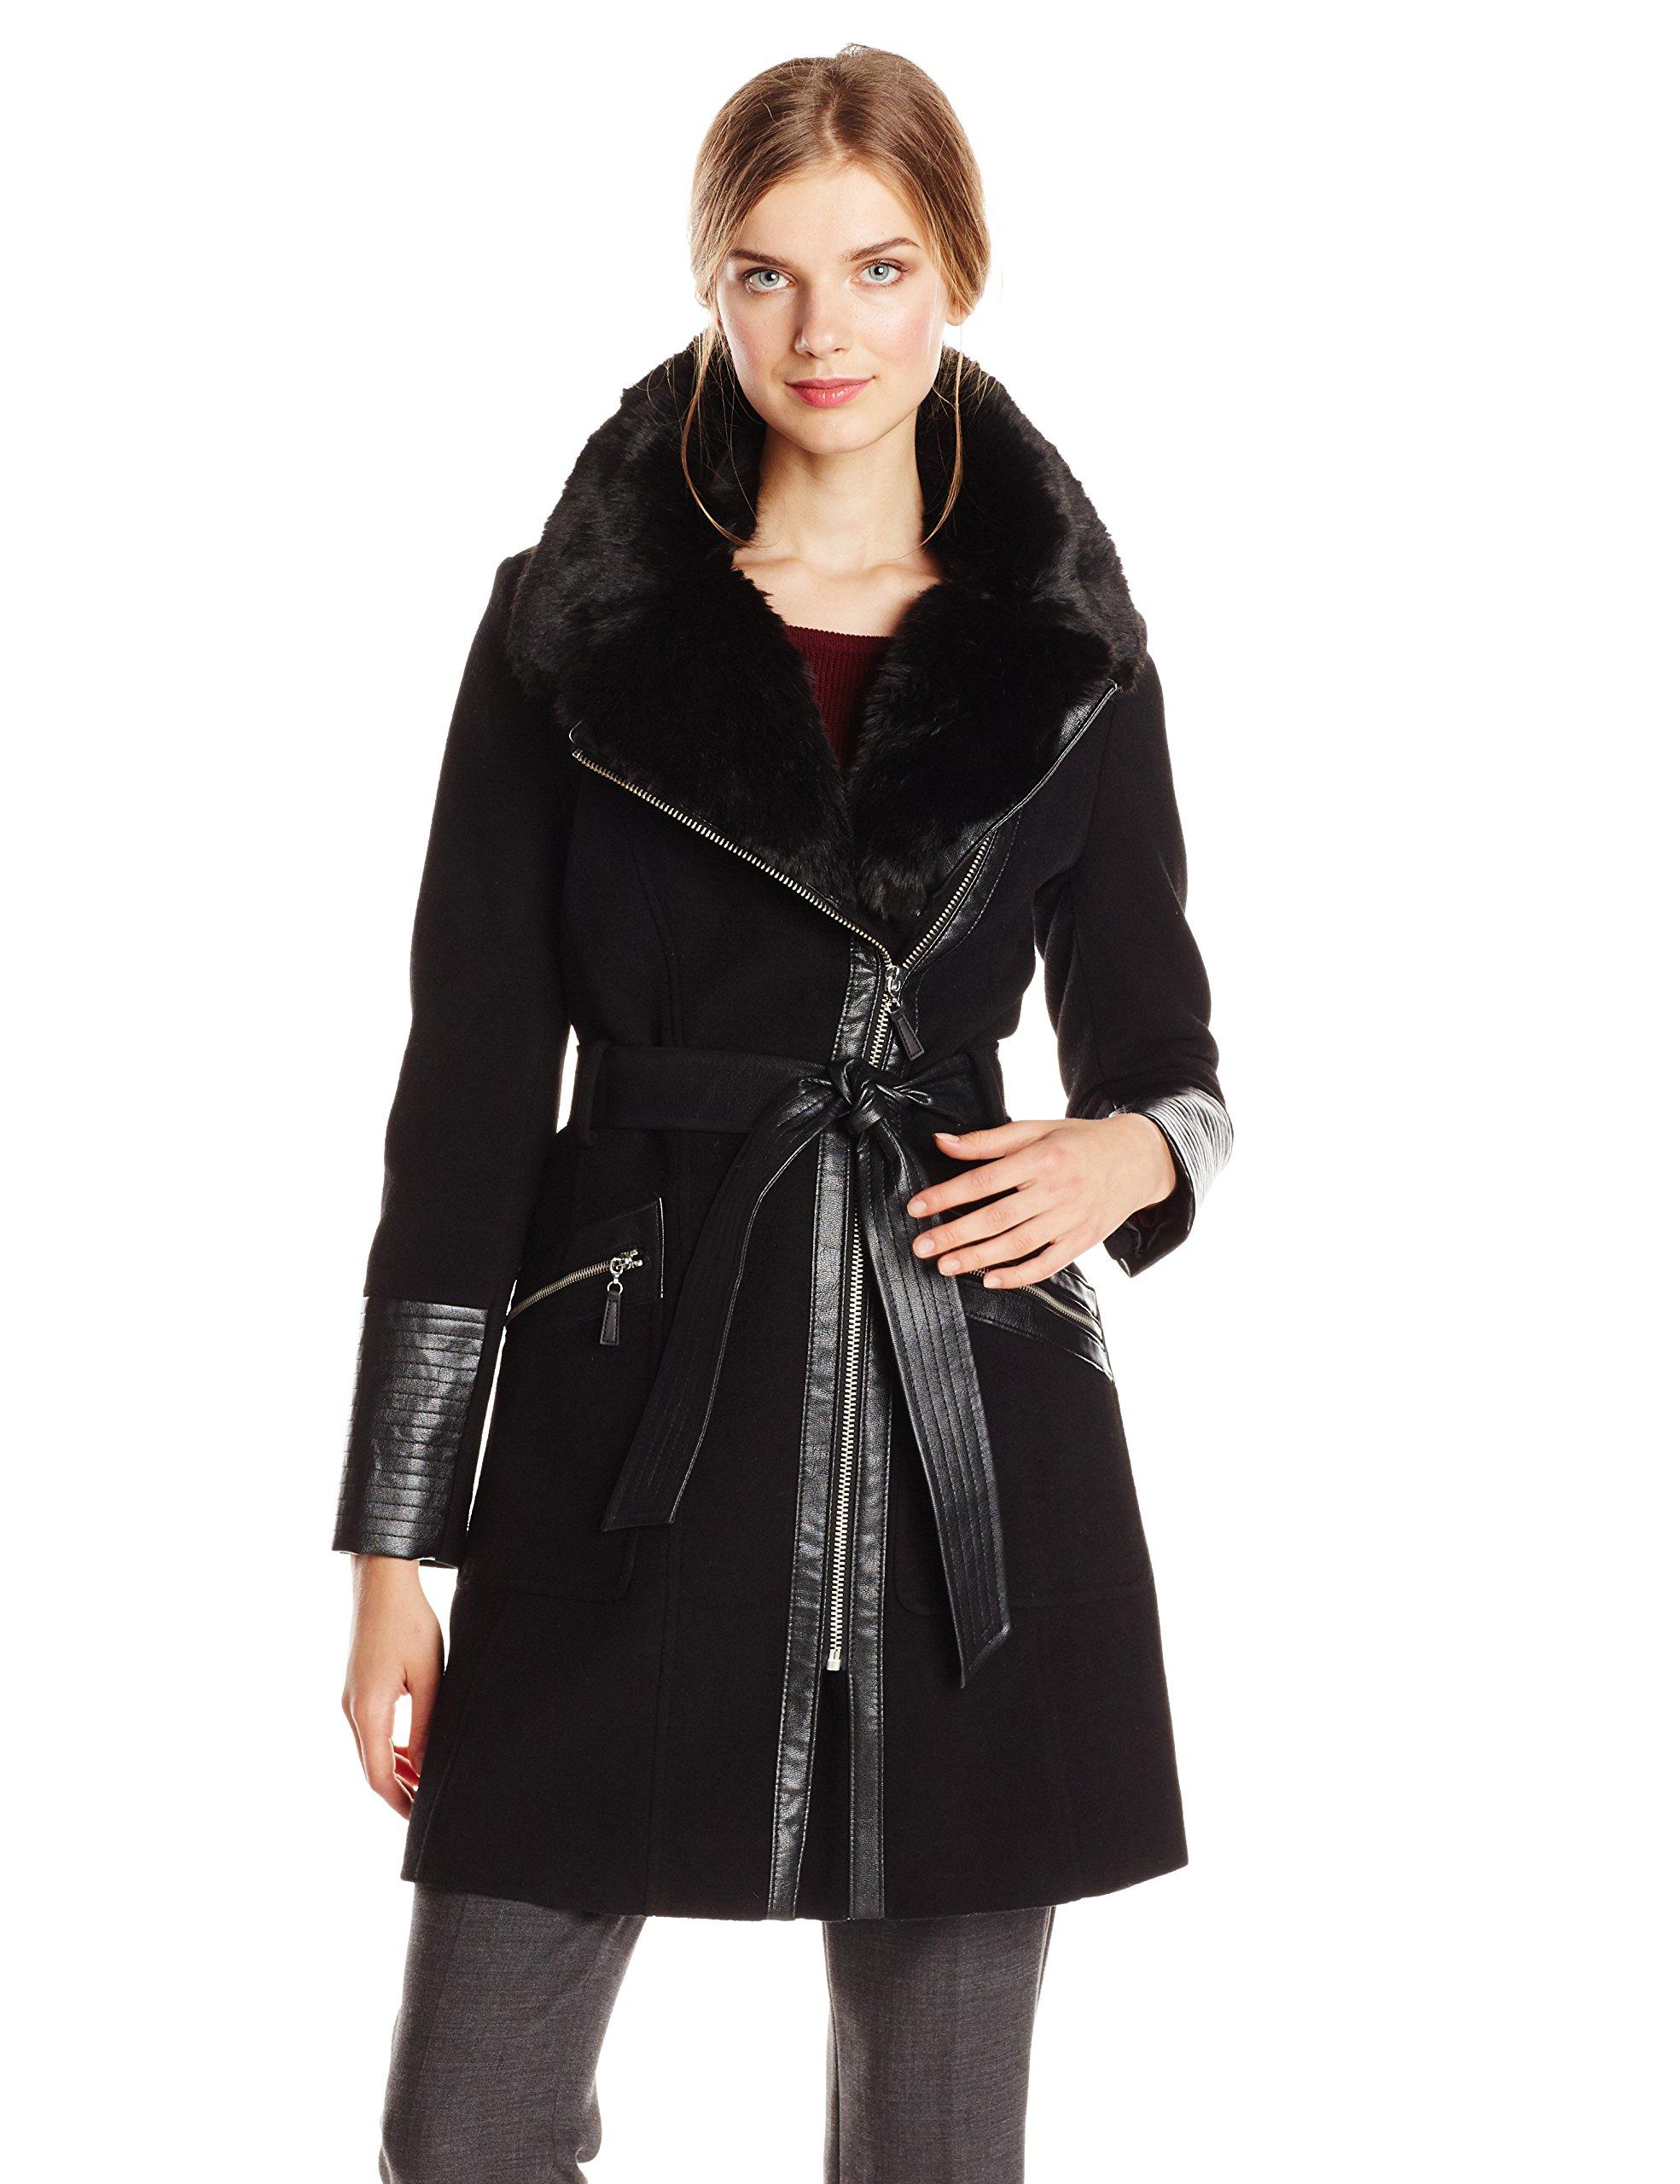 Via Spiga Women's Kate Wool Coat with Faux Fur Collar, Black, 8